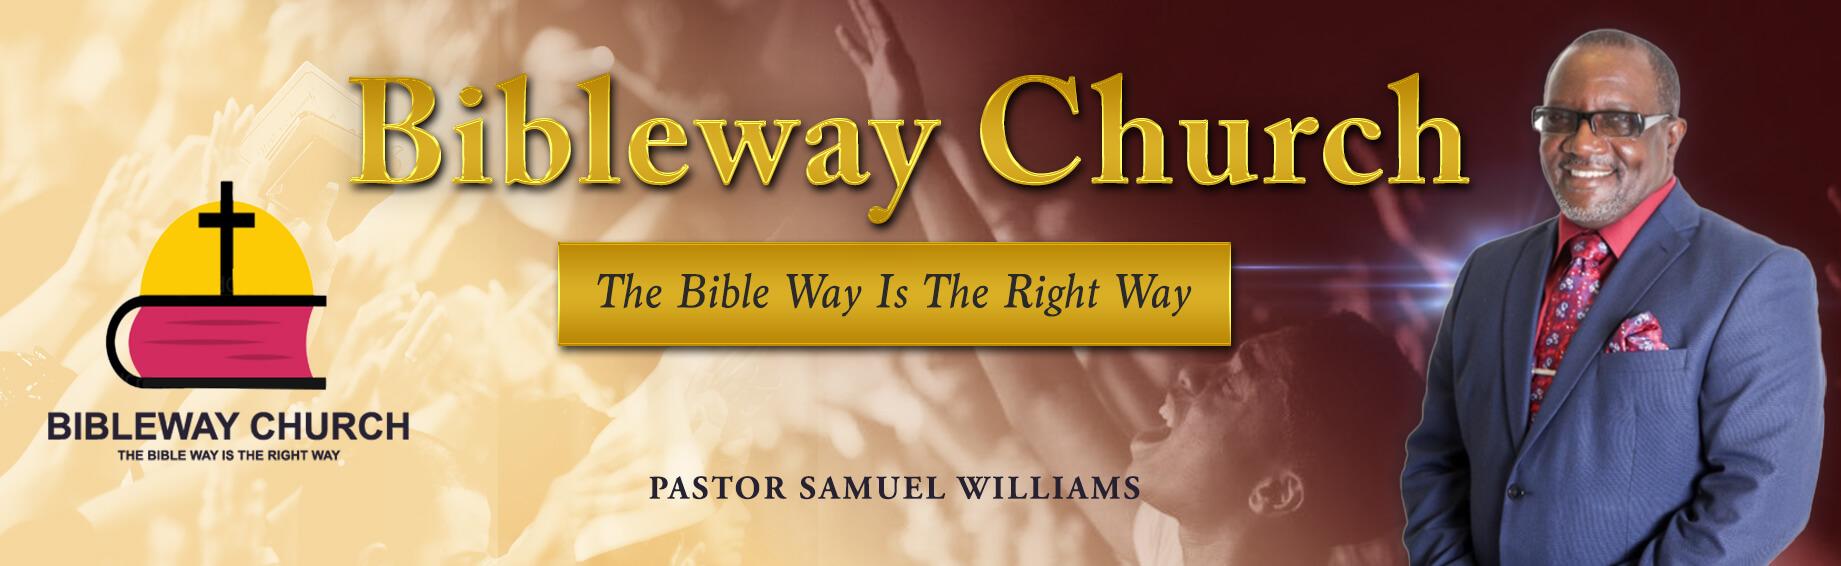 Bibleway Church Banner